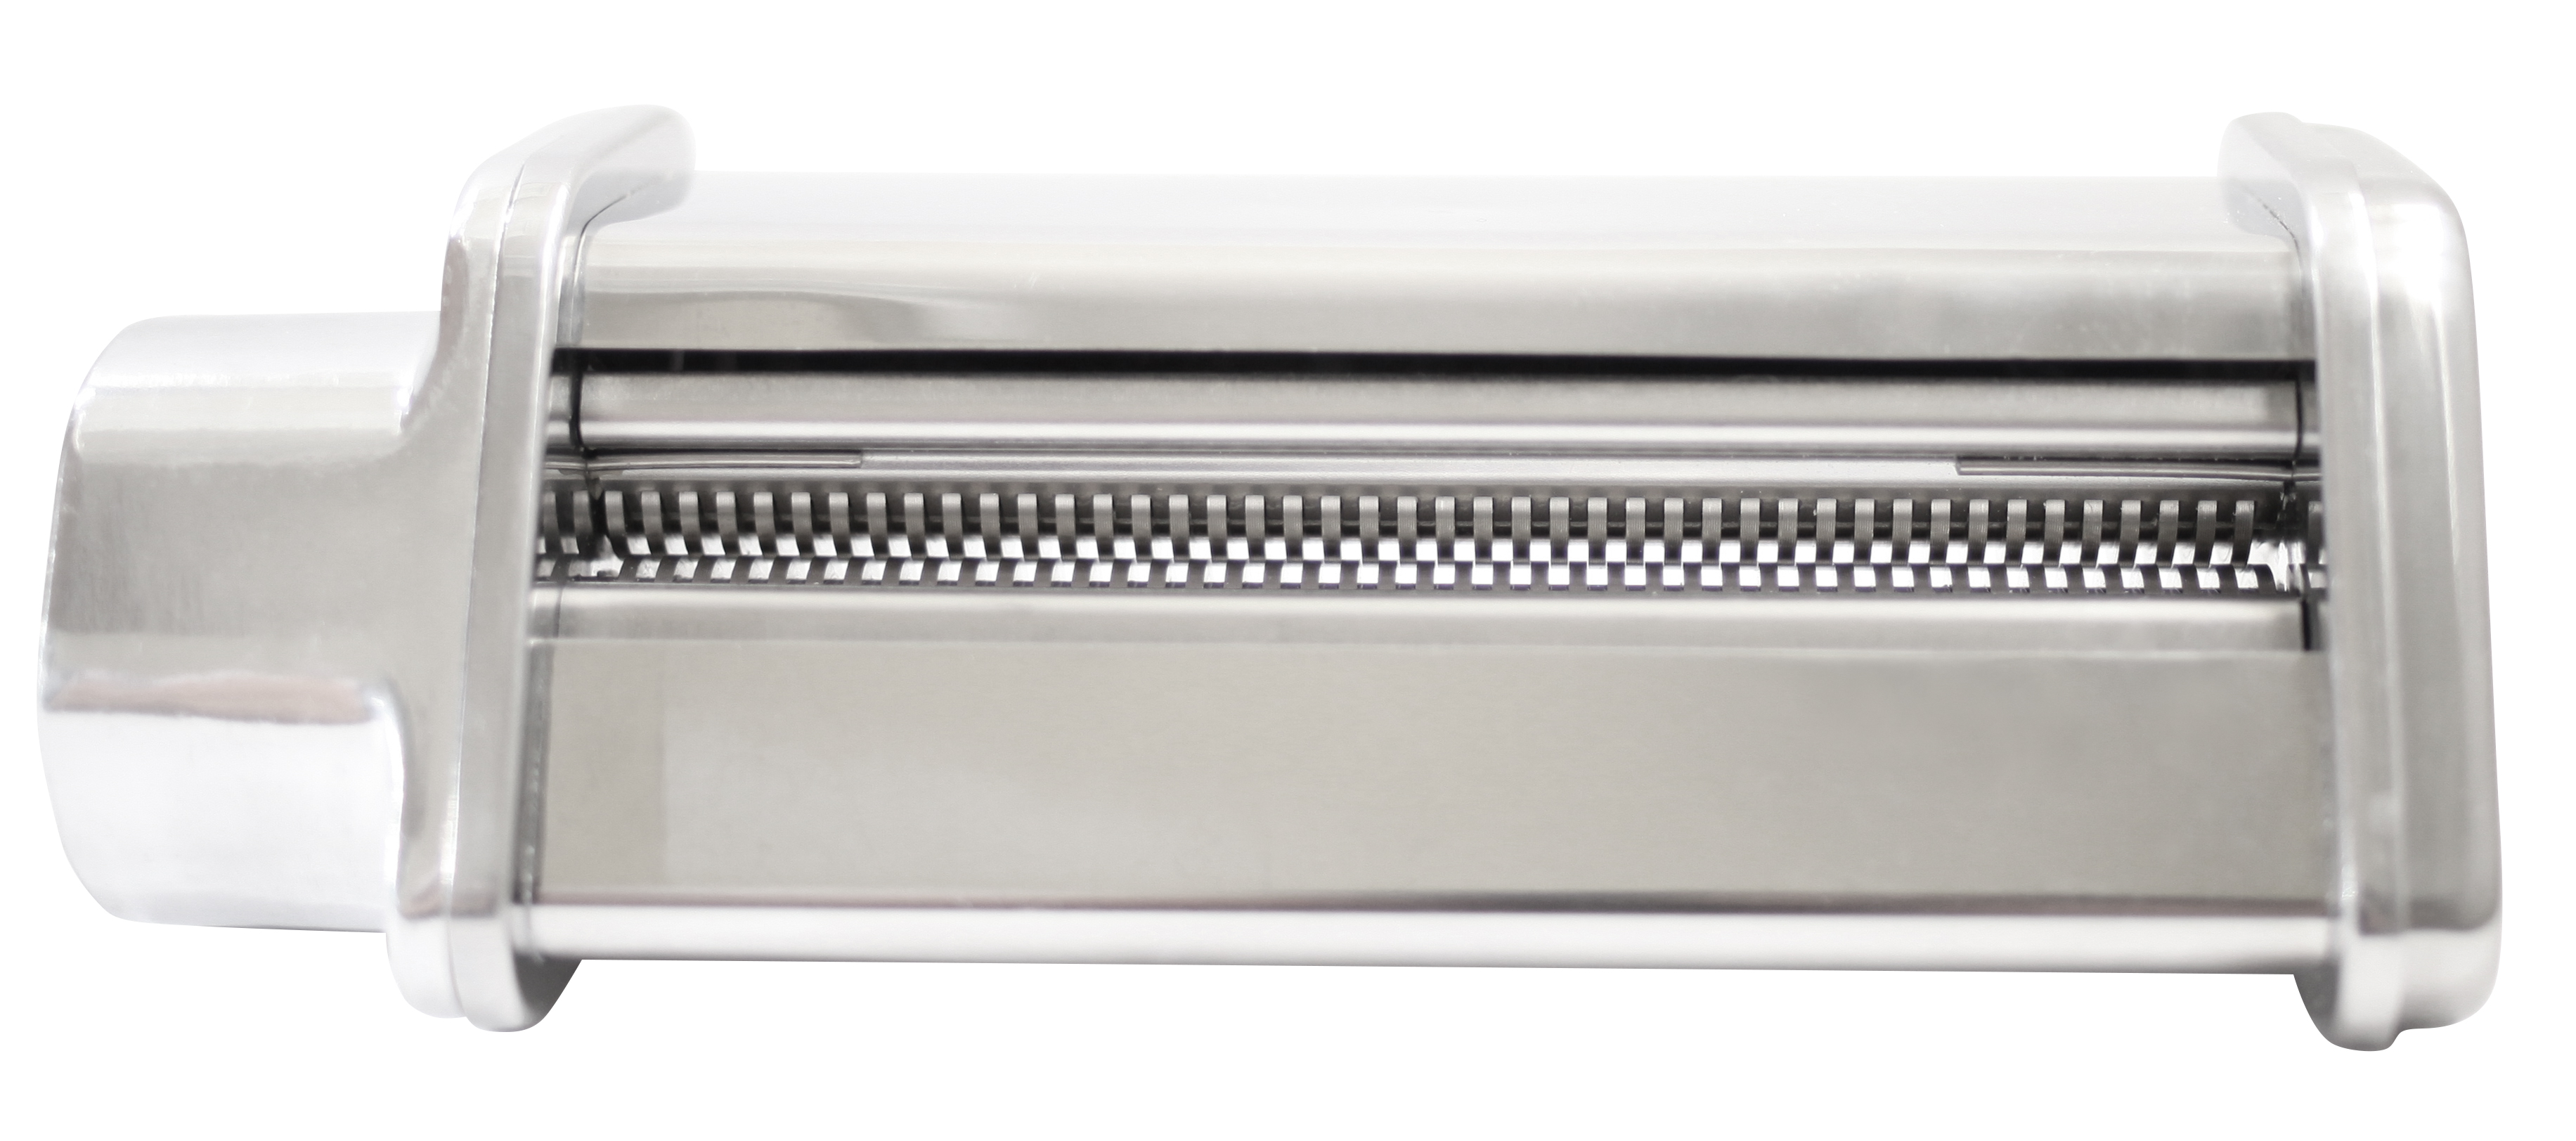 Spaghetti Cutter for Universal Mixer Plus (Part 540310)